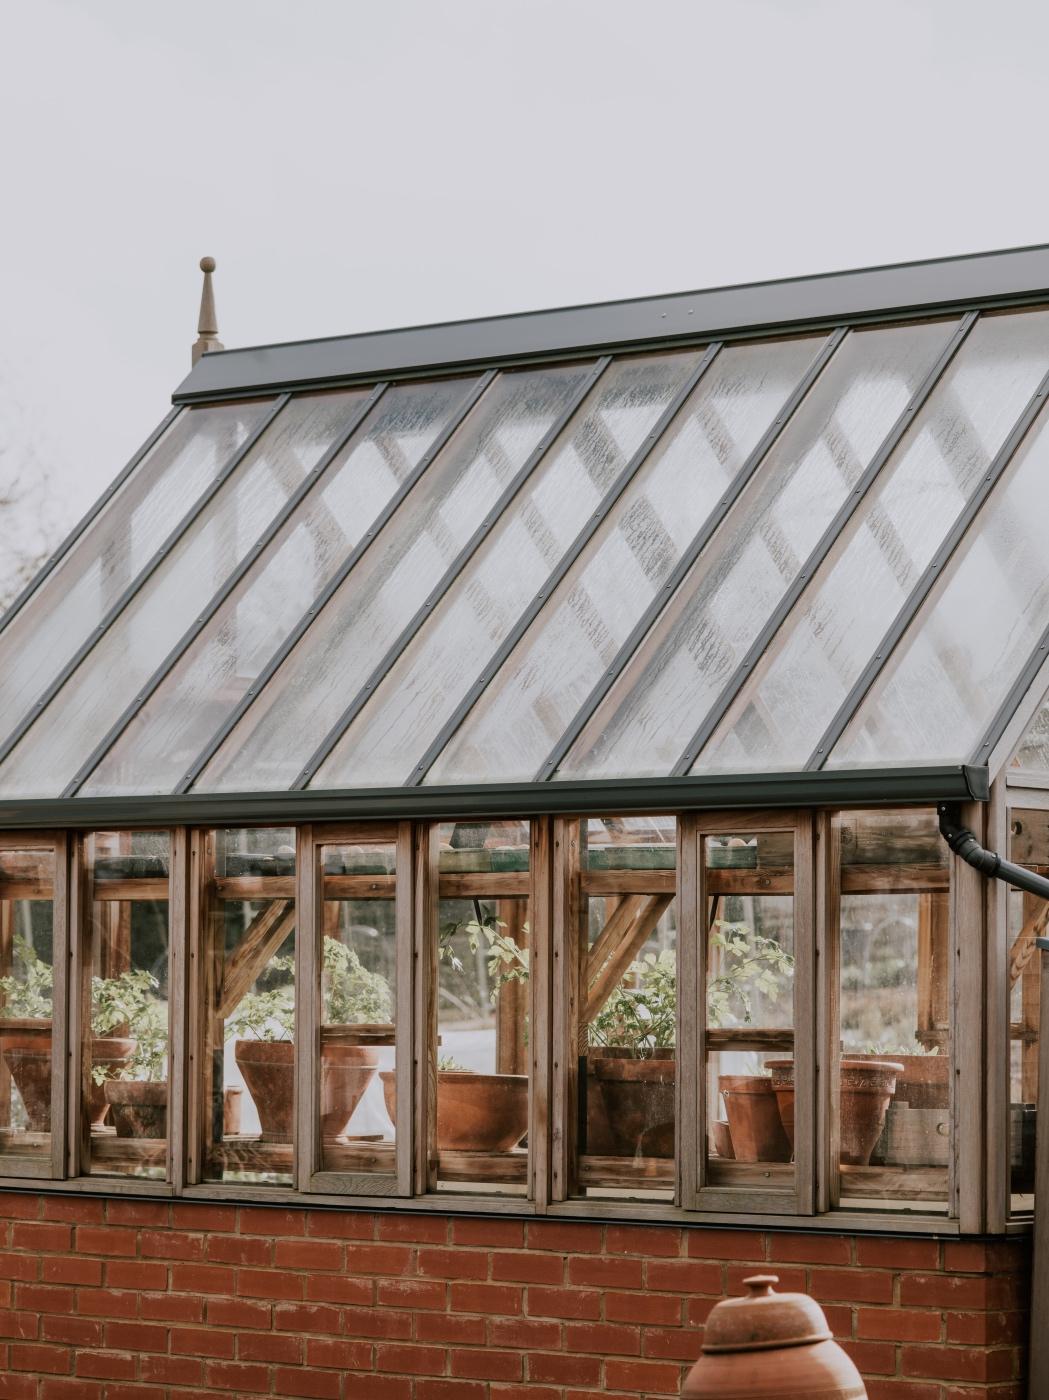 greenhouse gardening tutorial for beginners pop shop america